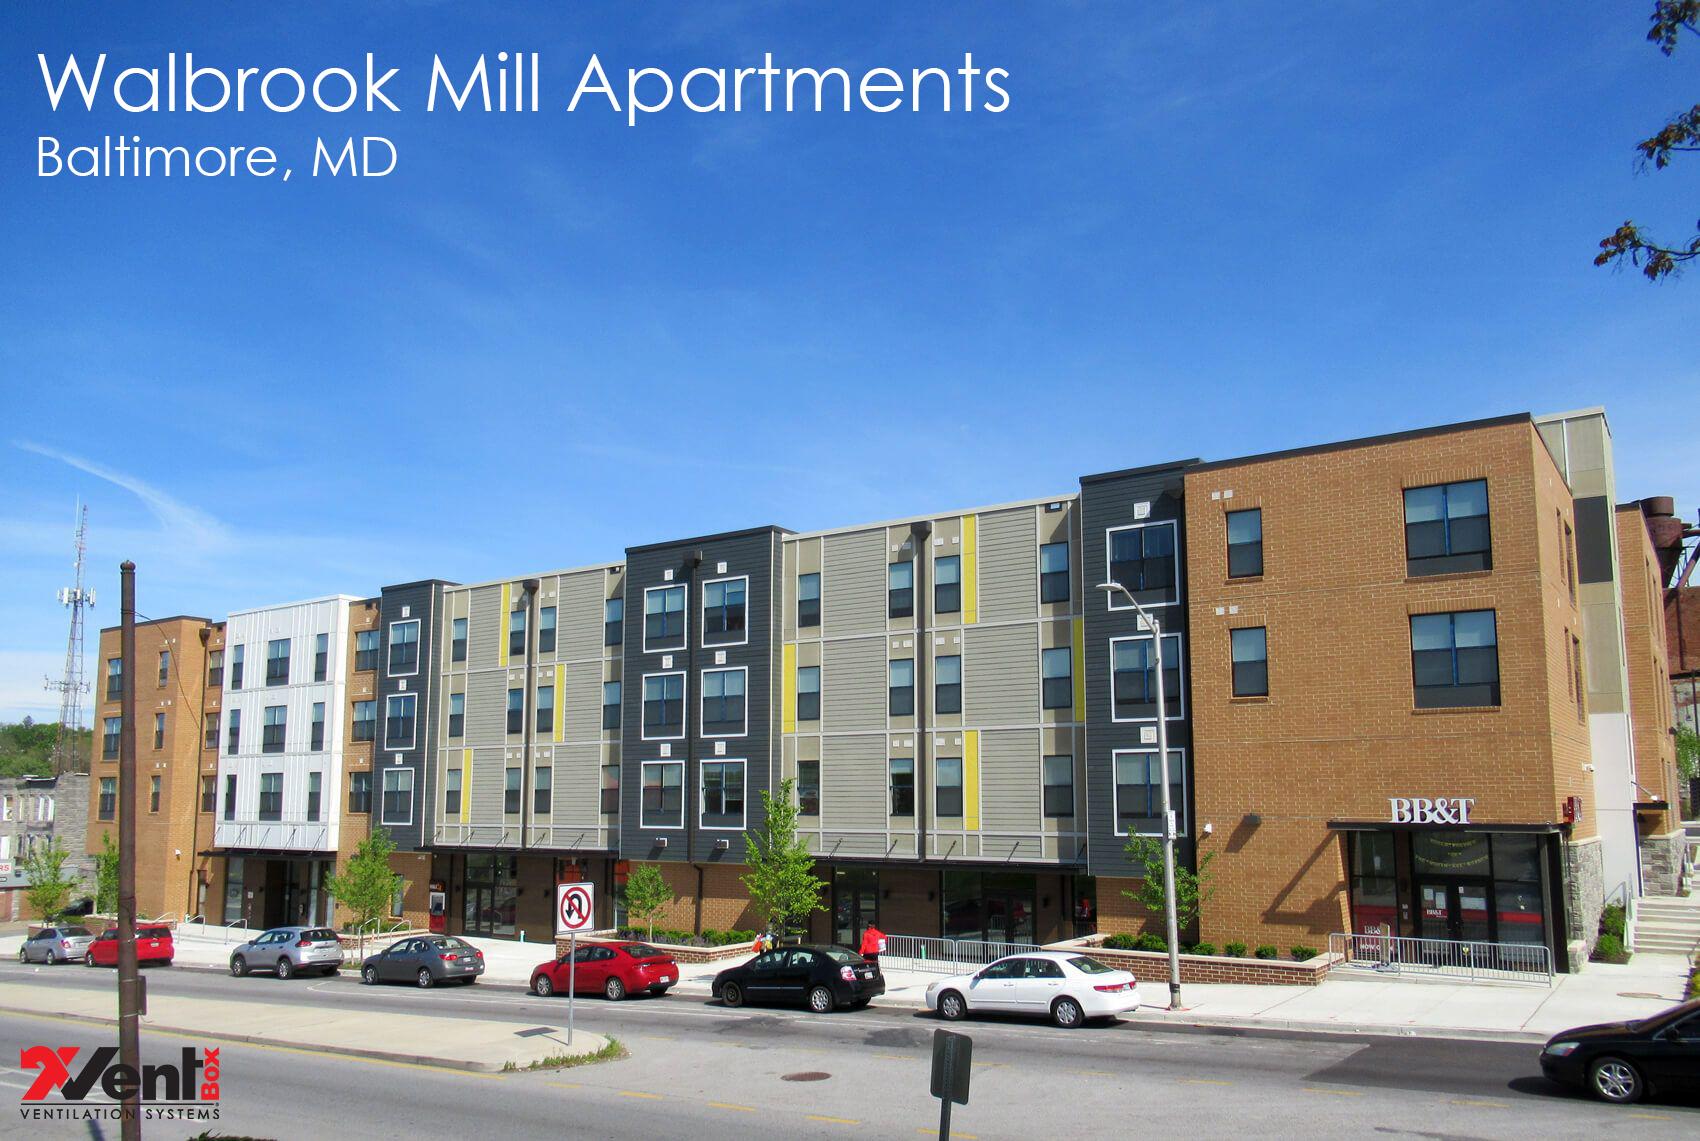 Walbrook Mill Apartments